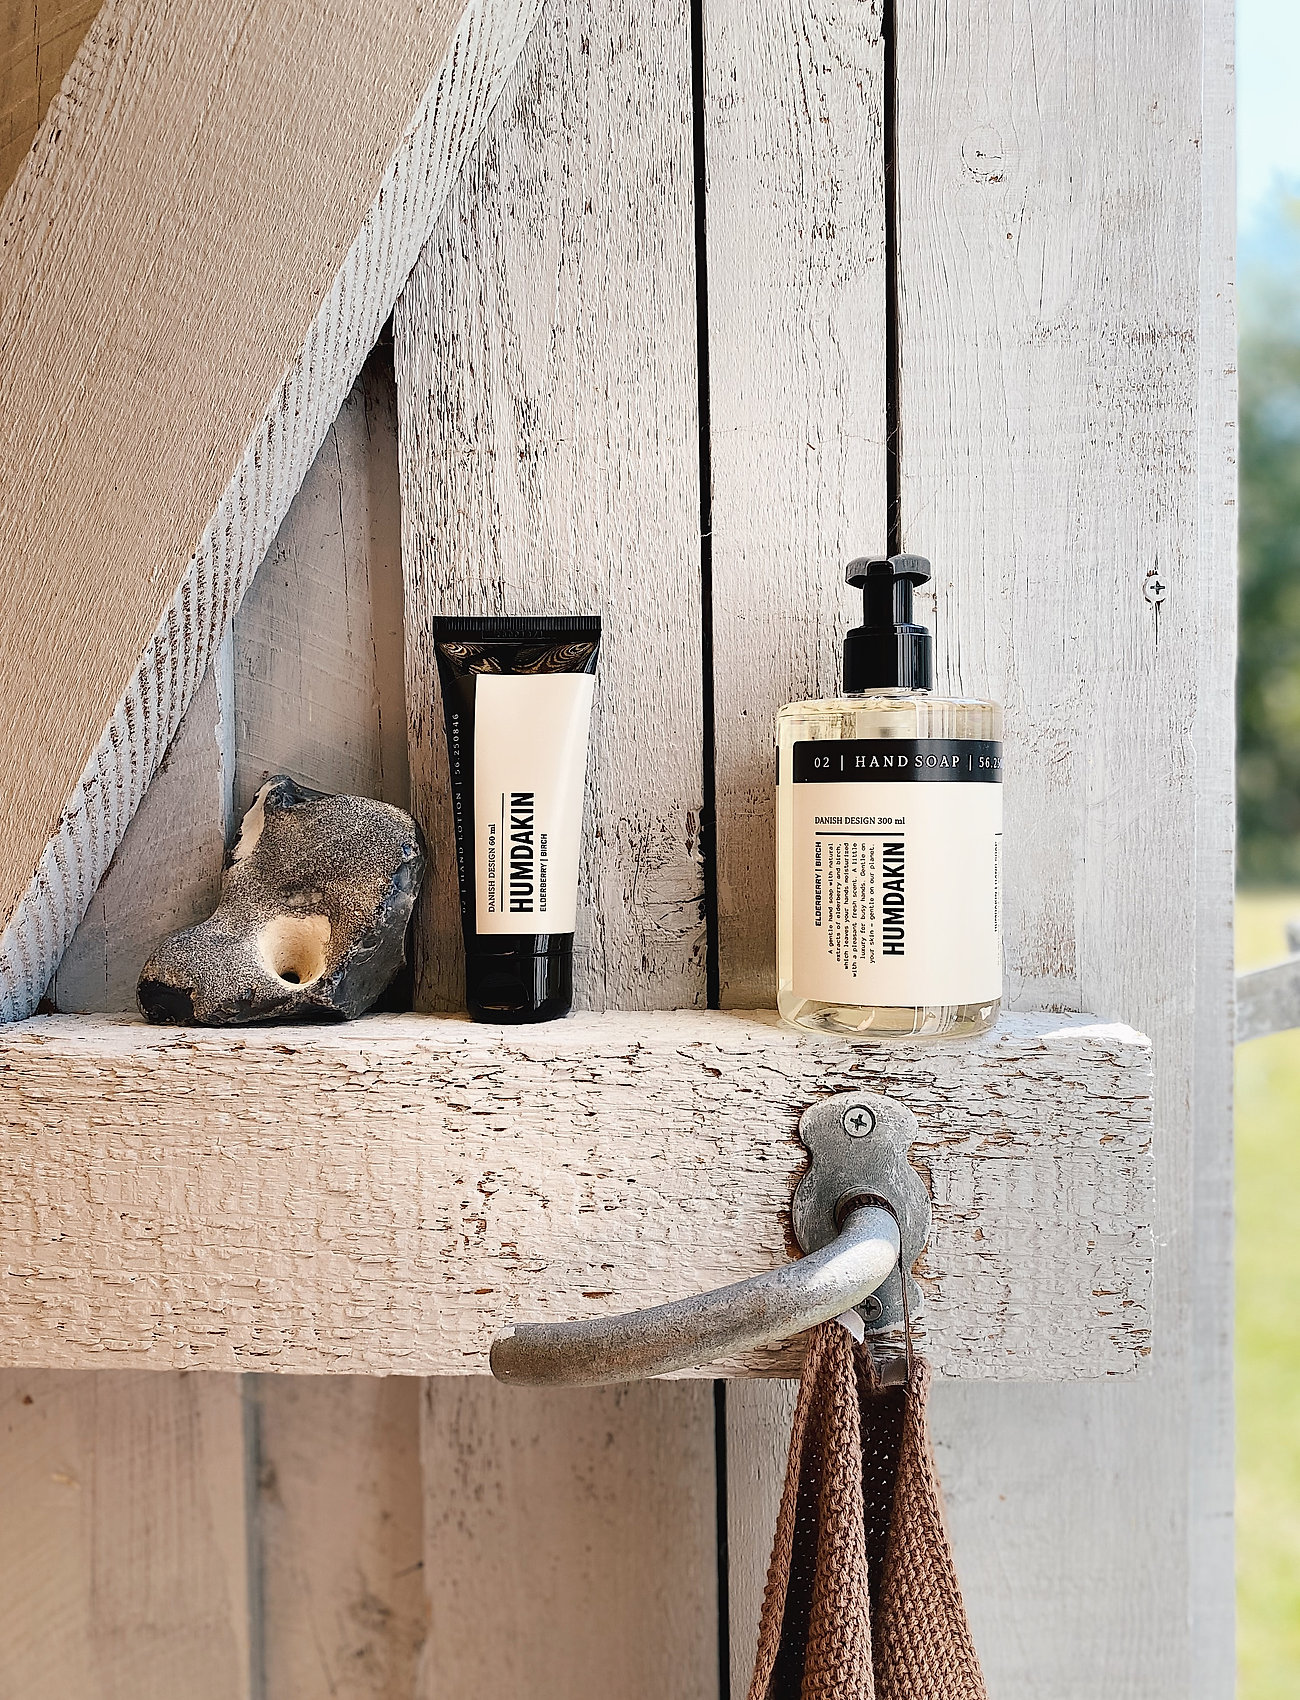 Humdakin - 02 hand soap - elderberry and birch - handtvål - clear - 0